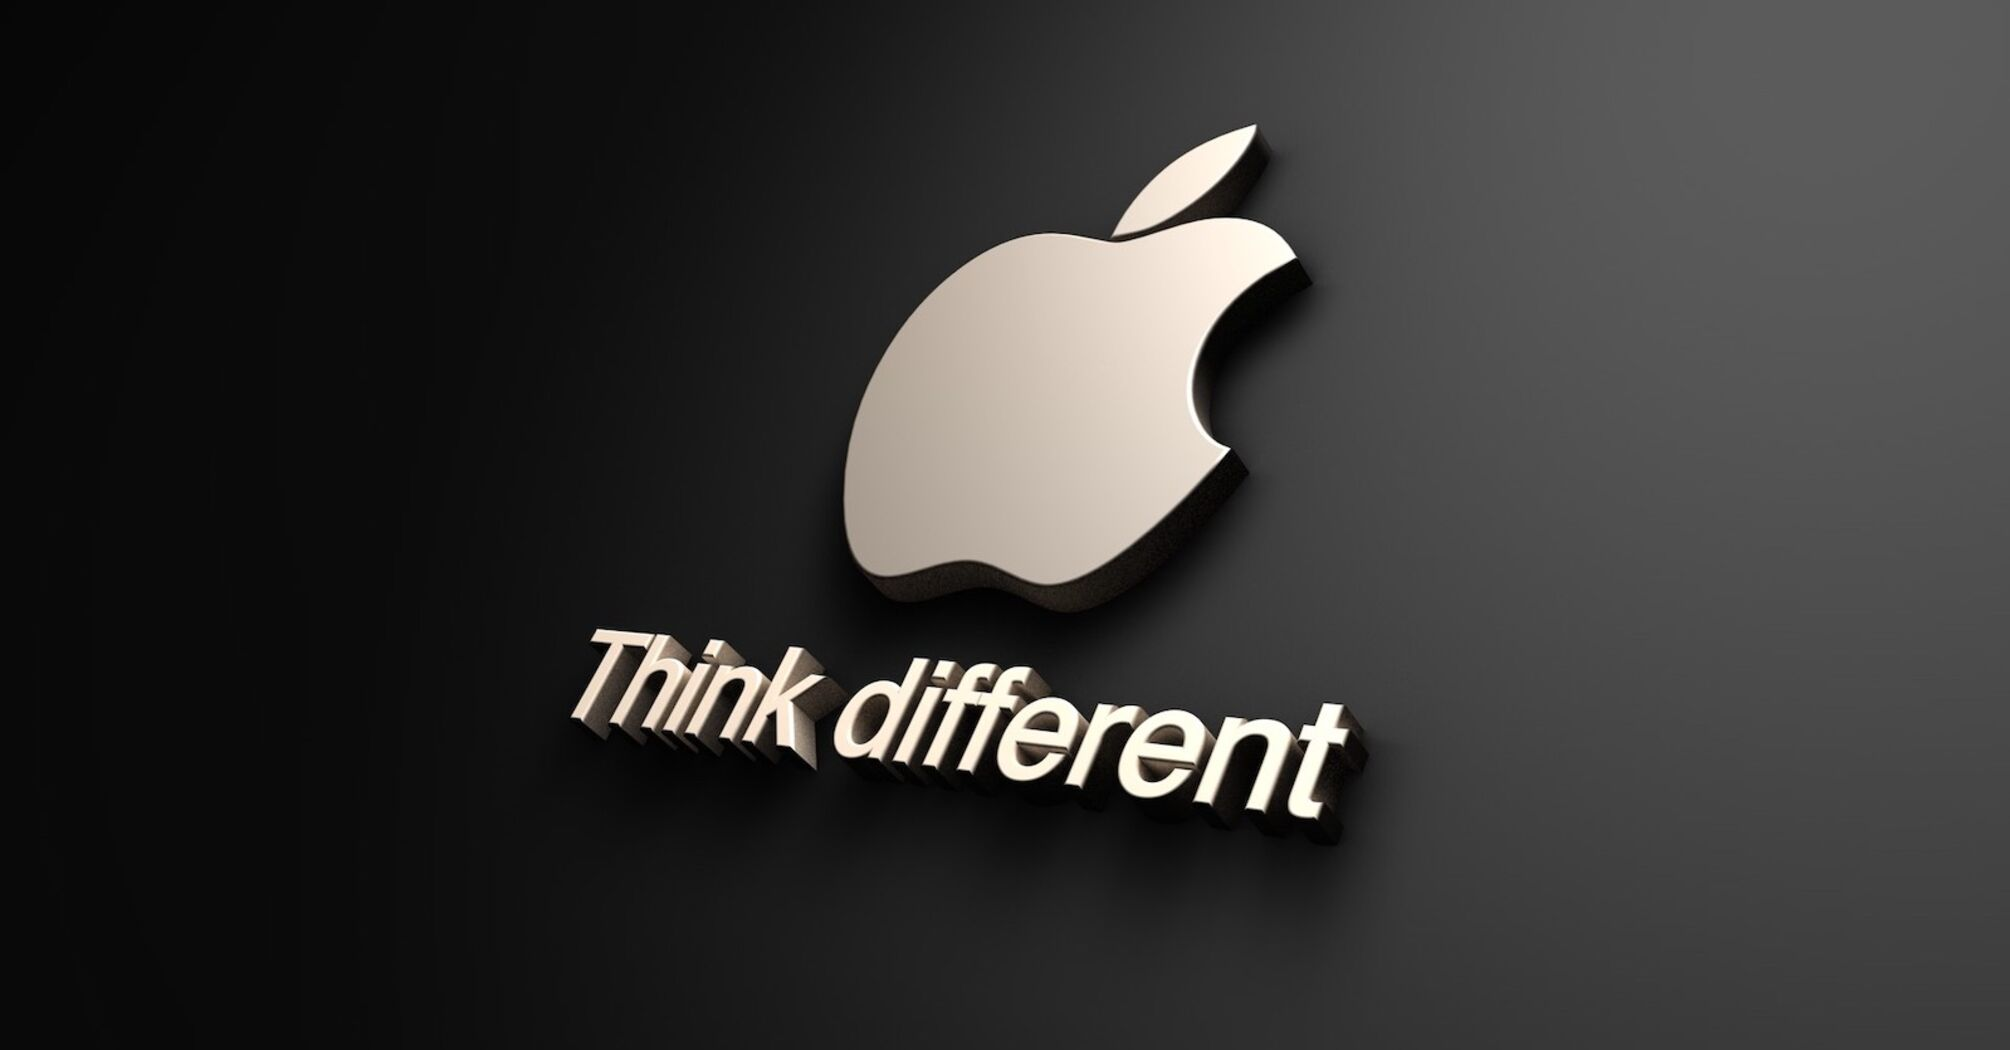 Выход Apple на рынок Украины: Siri заговорит по-украински